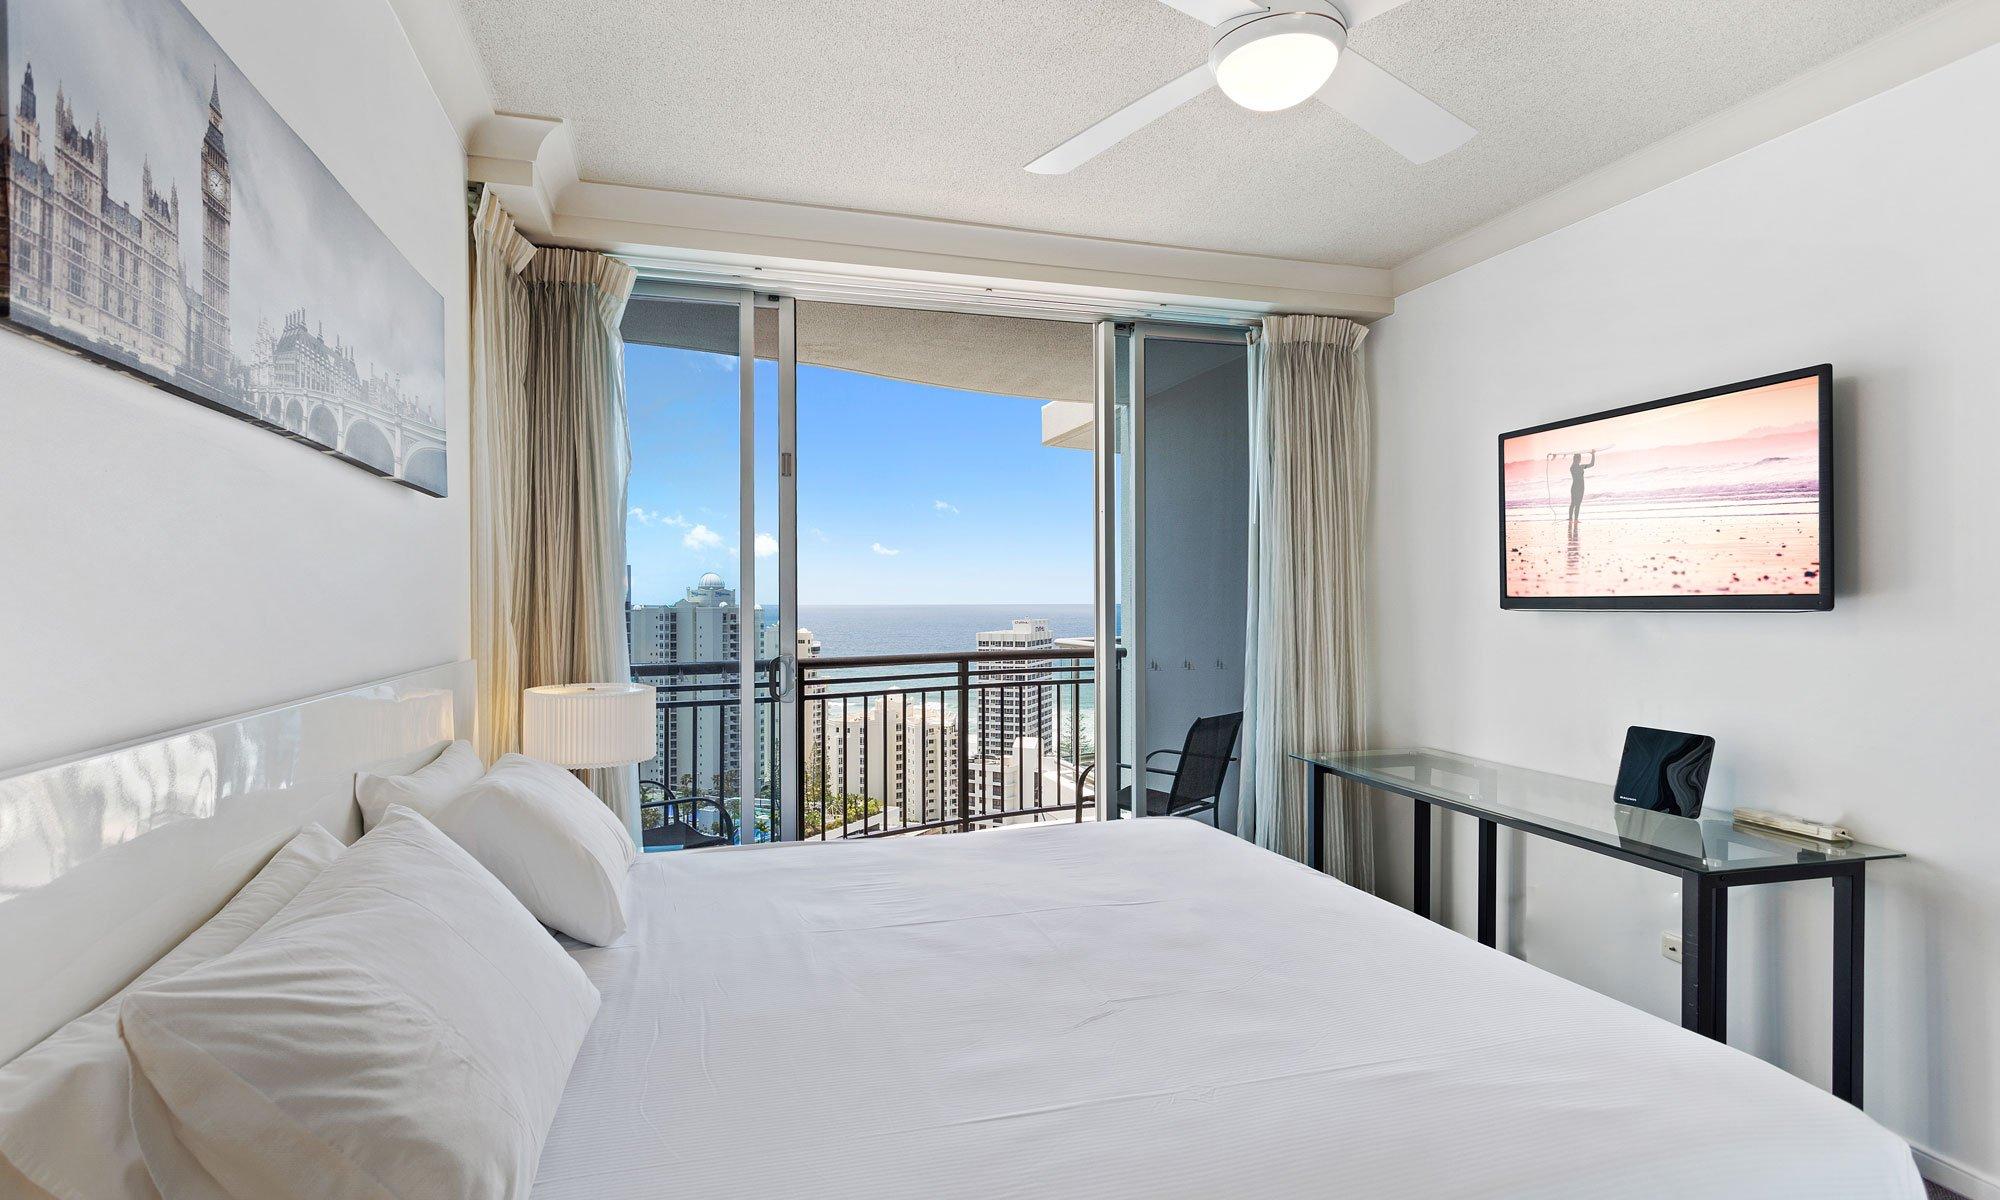 Gold Coast real estate for sale Chevron Renaissance 3223 main bedroom